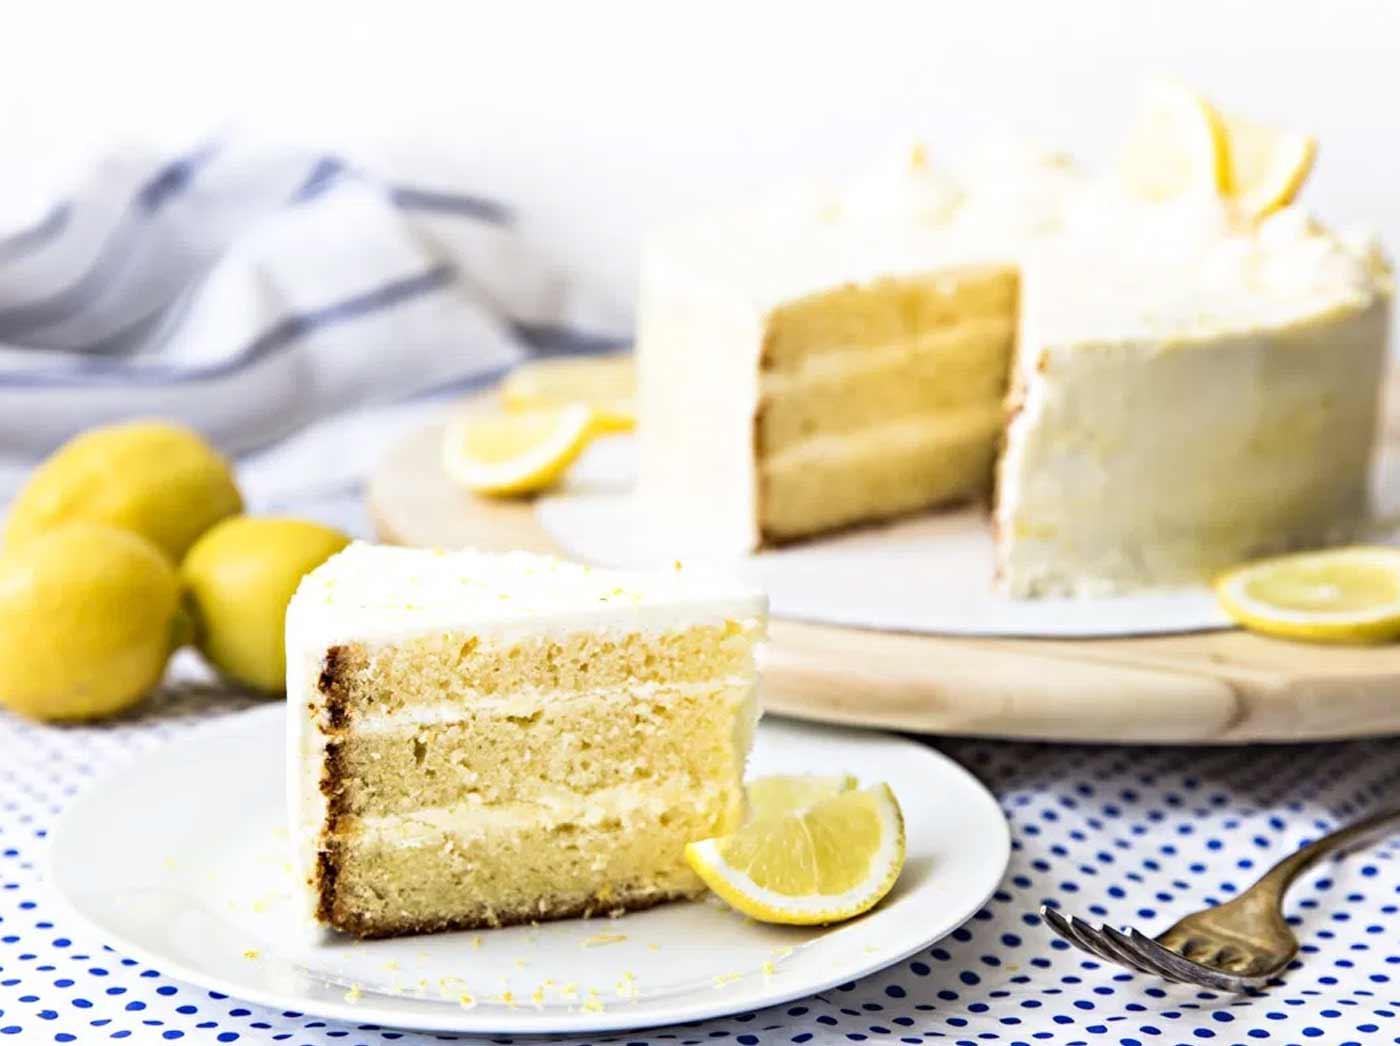 All Recipes Italian Lemon Cream Cake: LEMON LAYER CAKE WITH MASCARPONE CREAM FROSTING